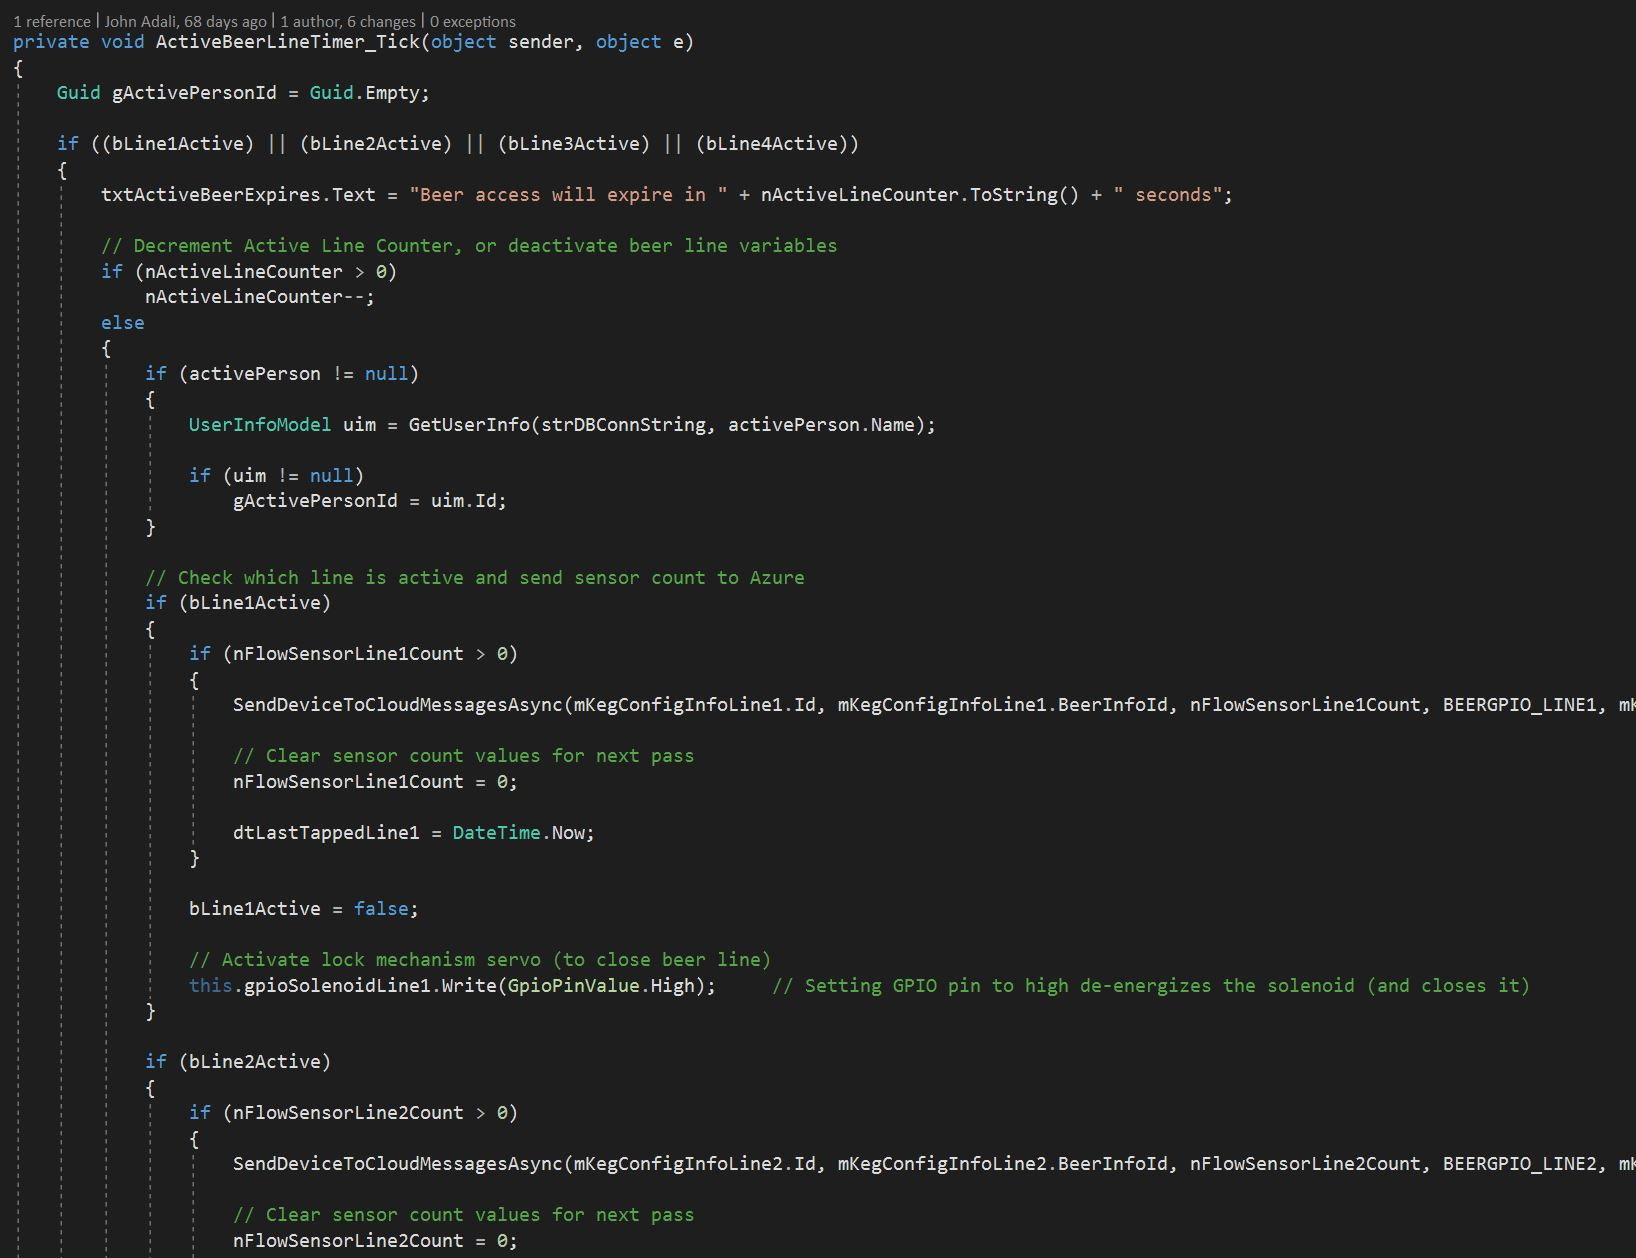 ActiveTimerTick_CodeSnippet